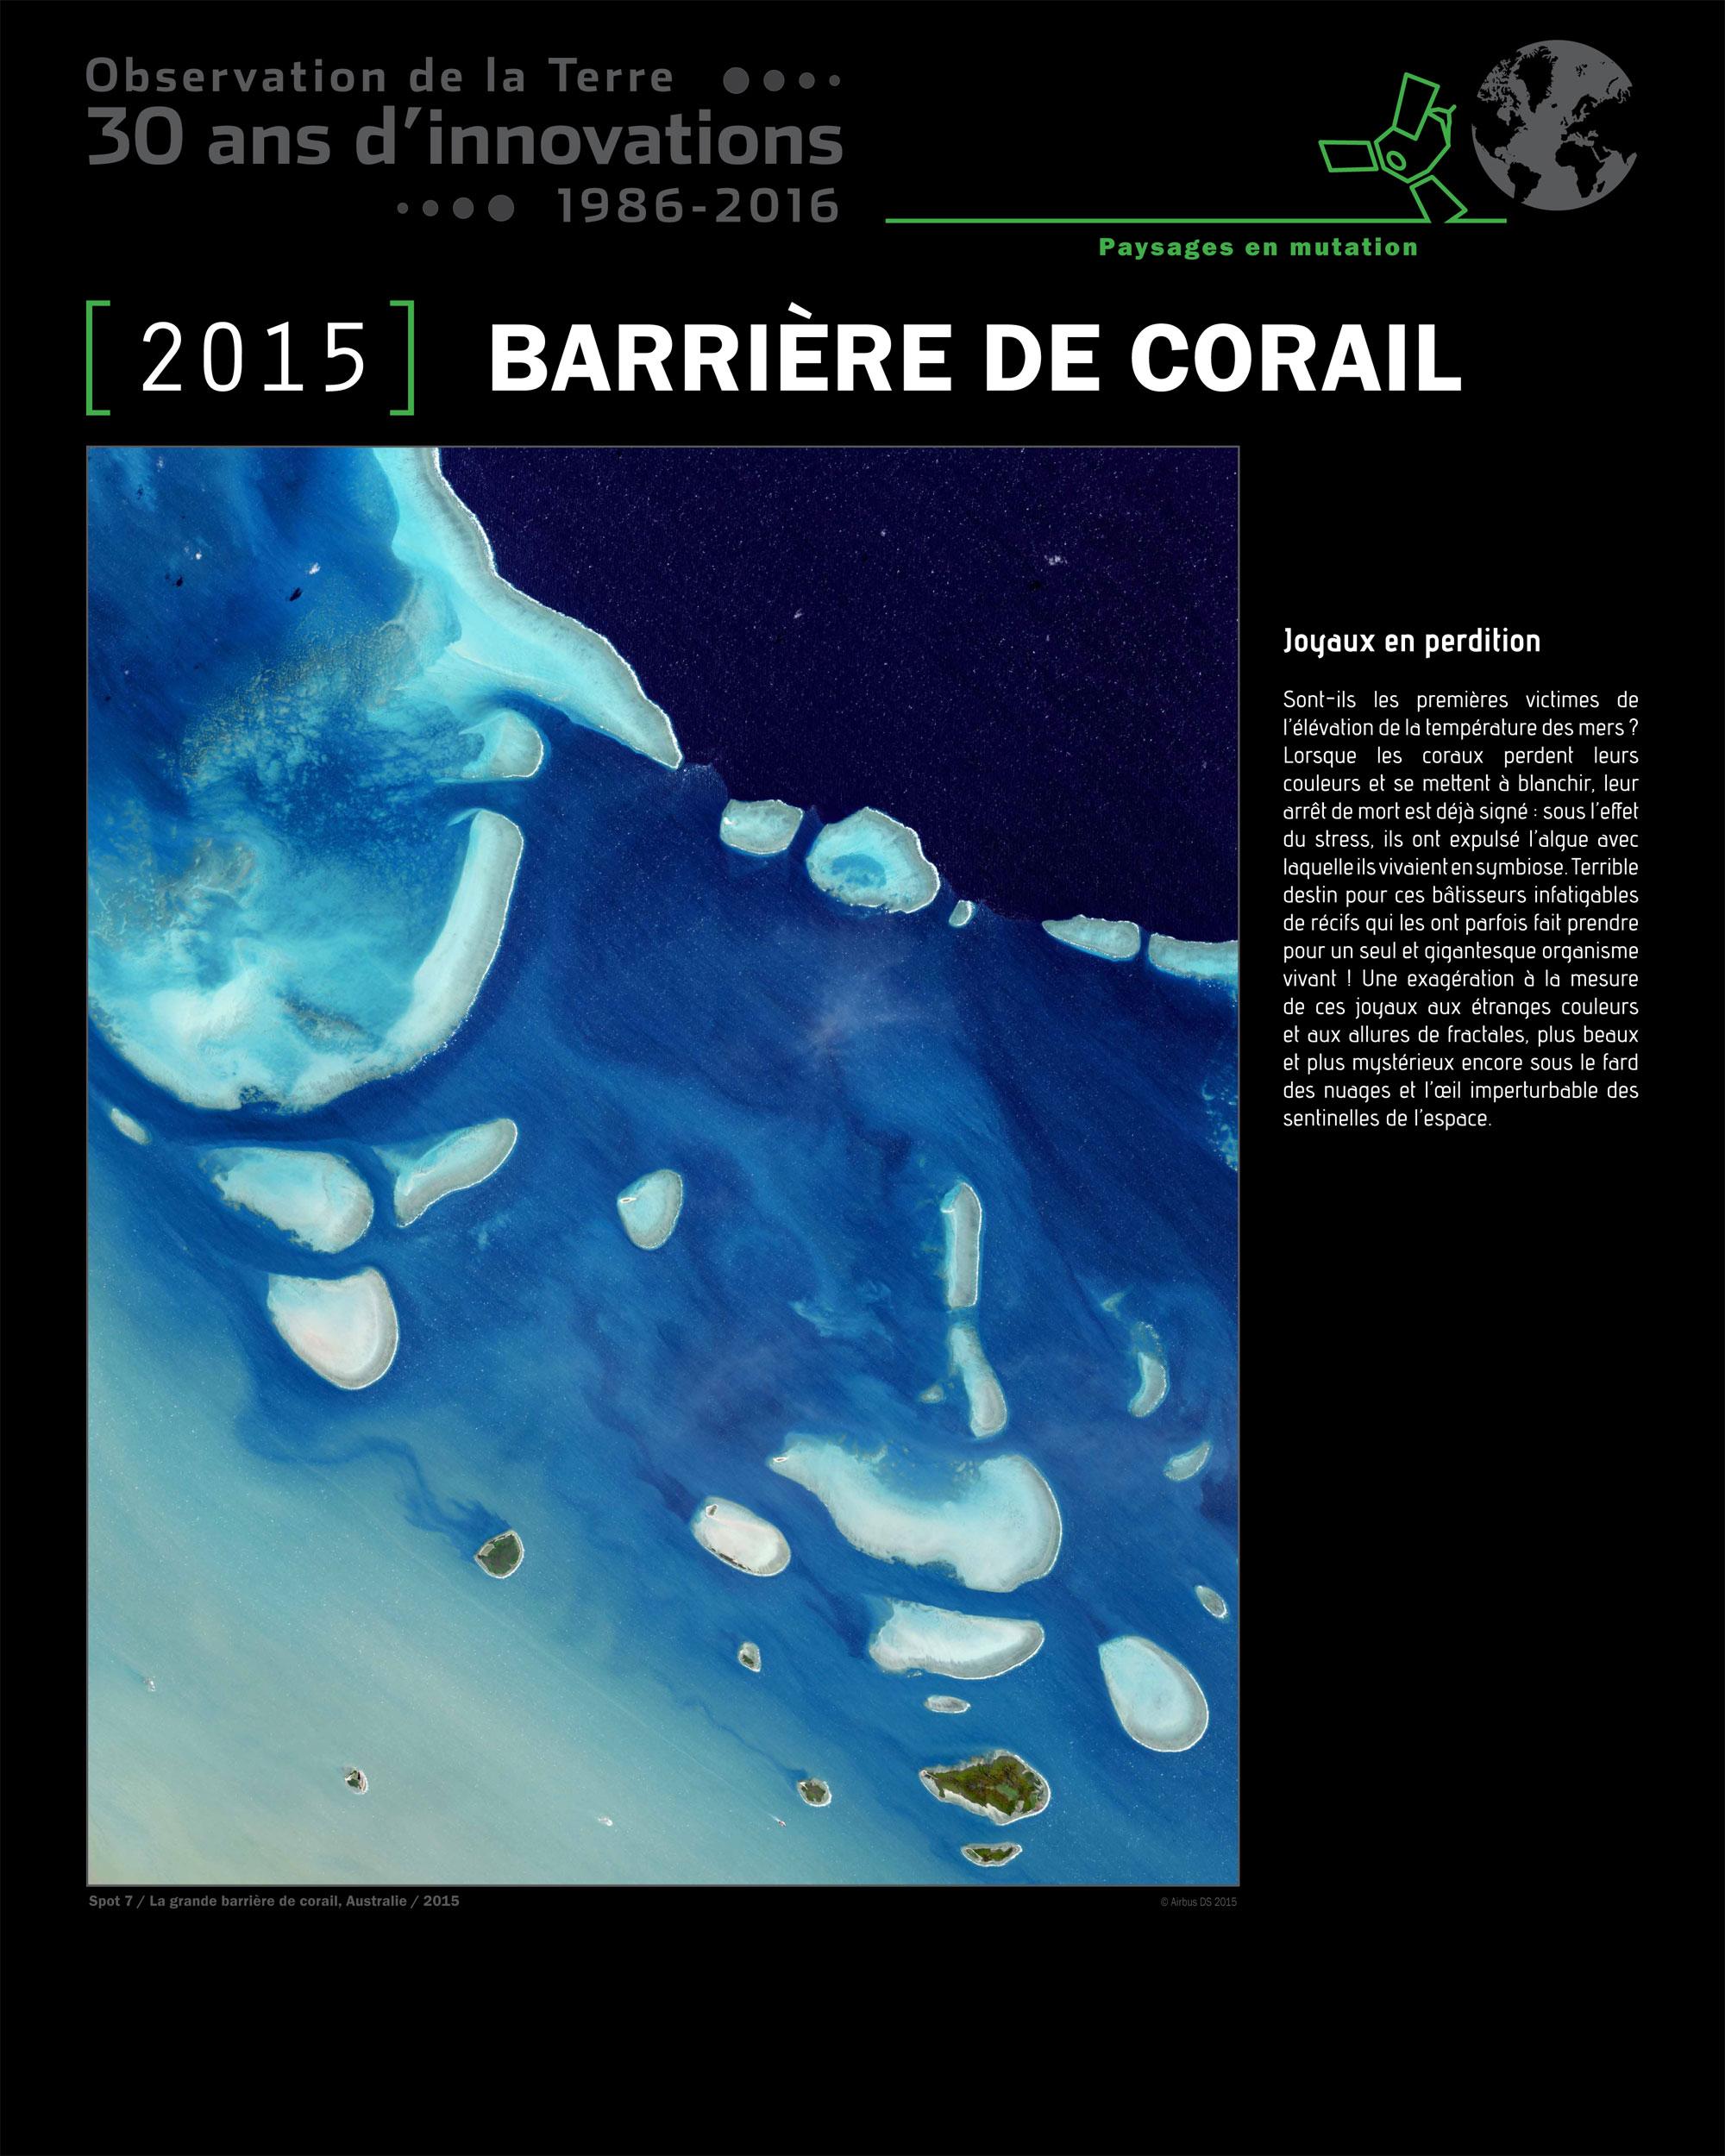 is_spot-30ans-barriere-corail-14.jpg